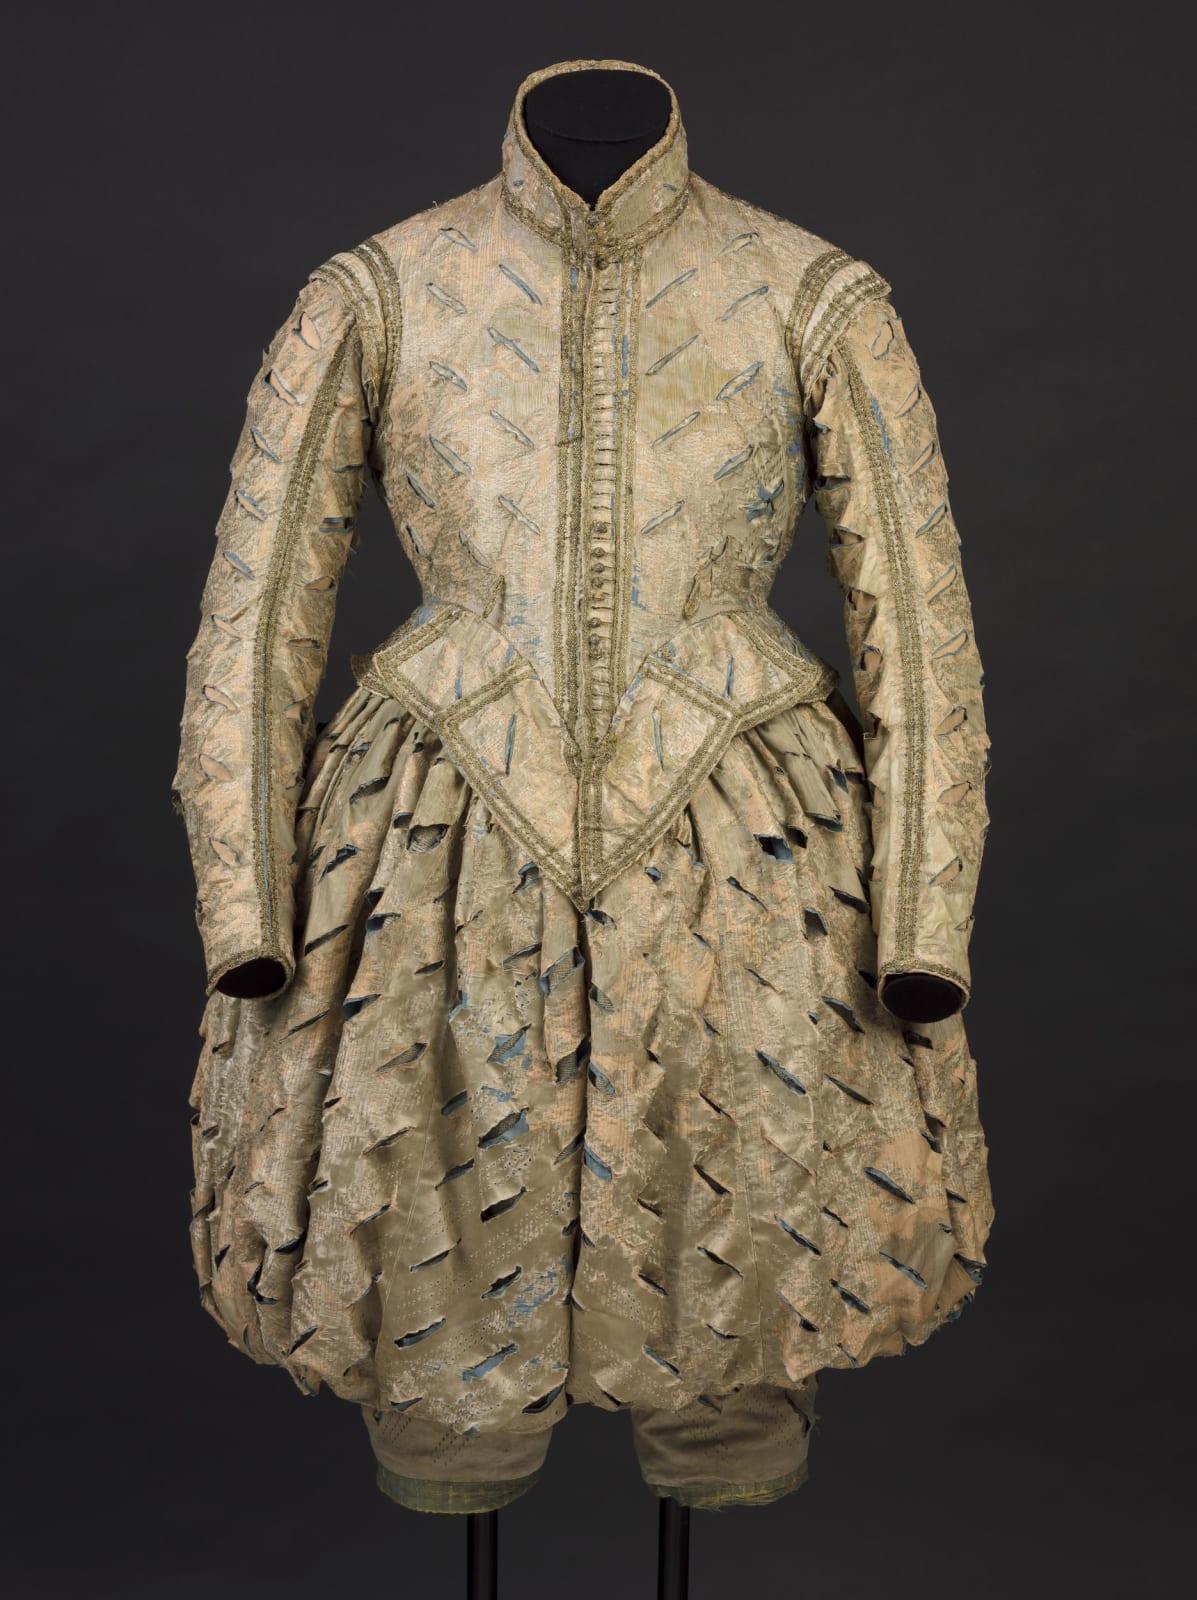 Sir Rowland Cotton (1581 – 1634) of Alkington Hall, Whitechurch, and Bellaport Hall, Shropshire